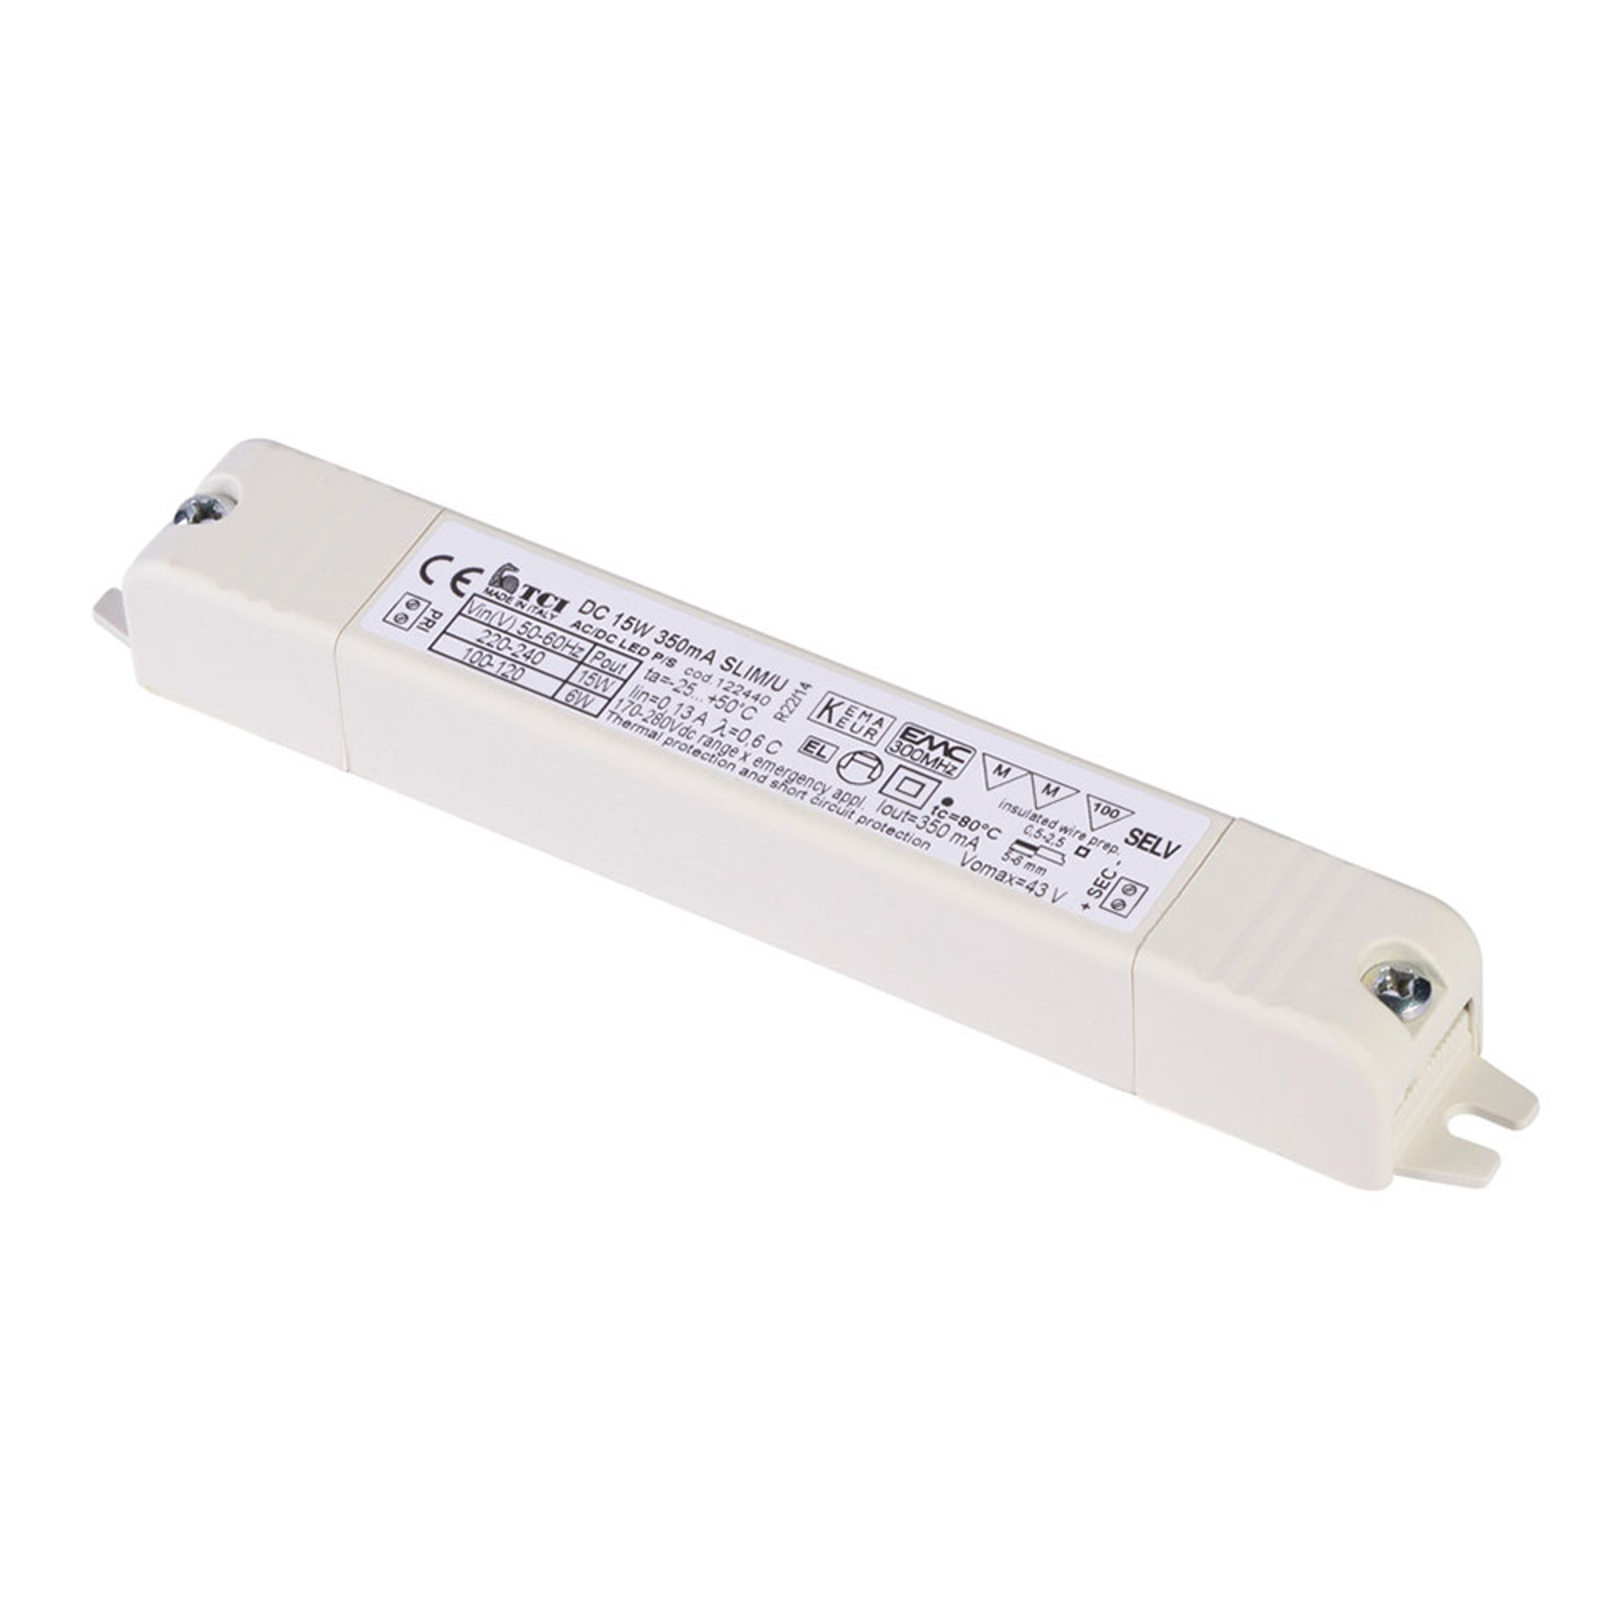 SLV LED-Treiber 350mA/15W mit Zugentlastung